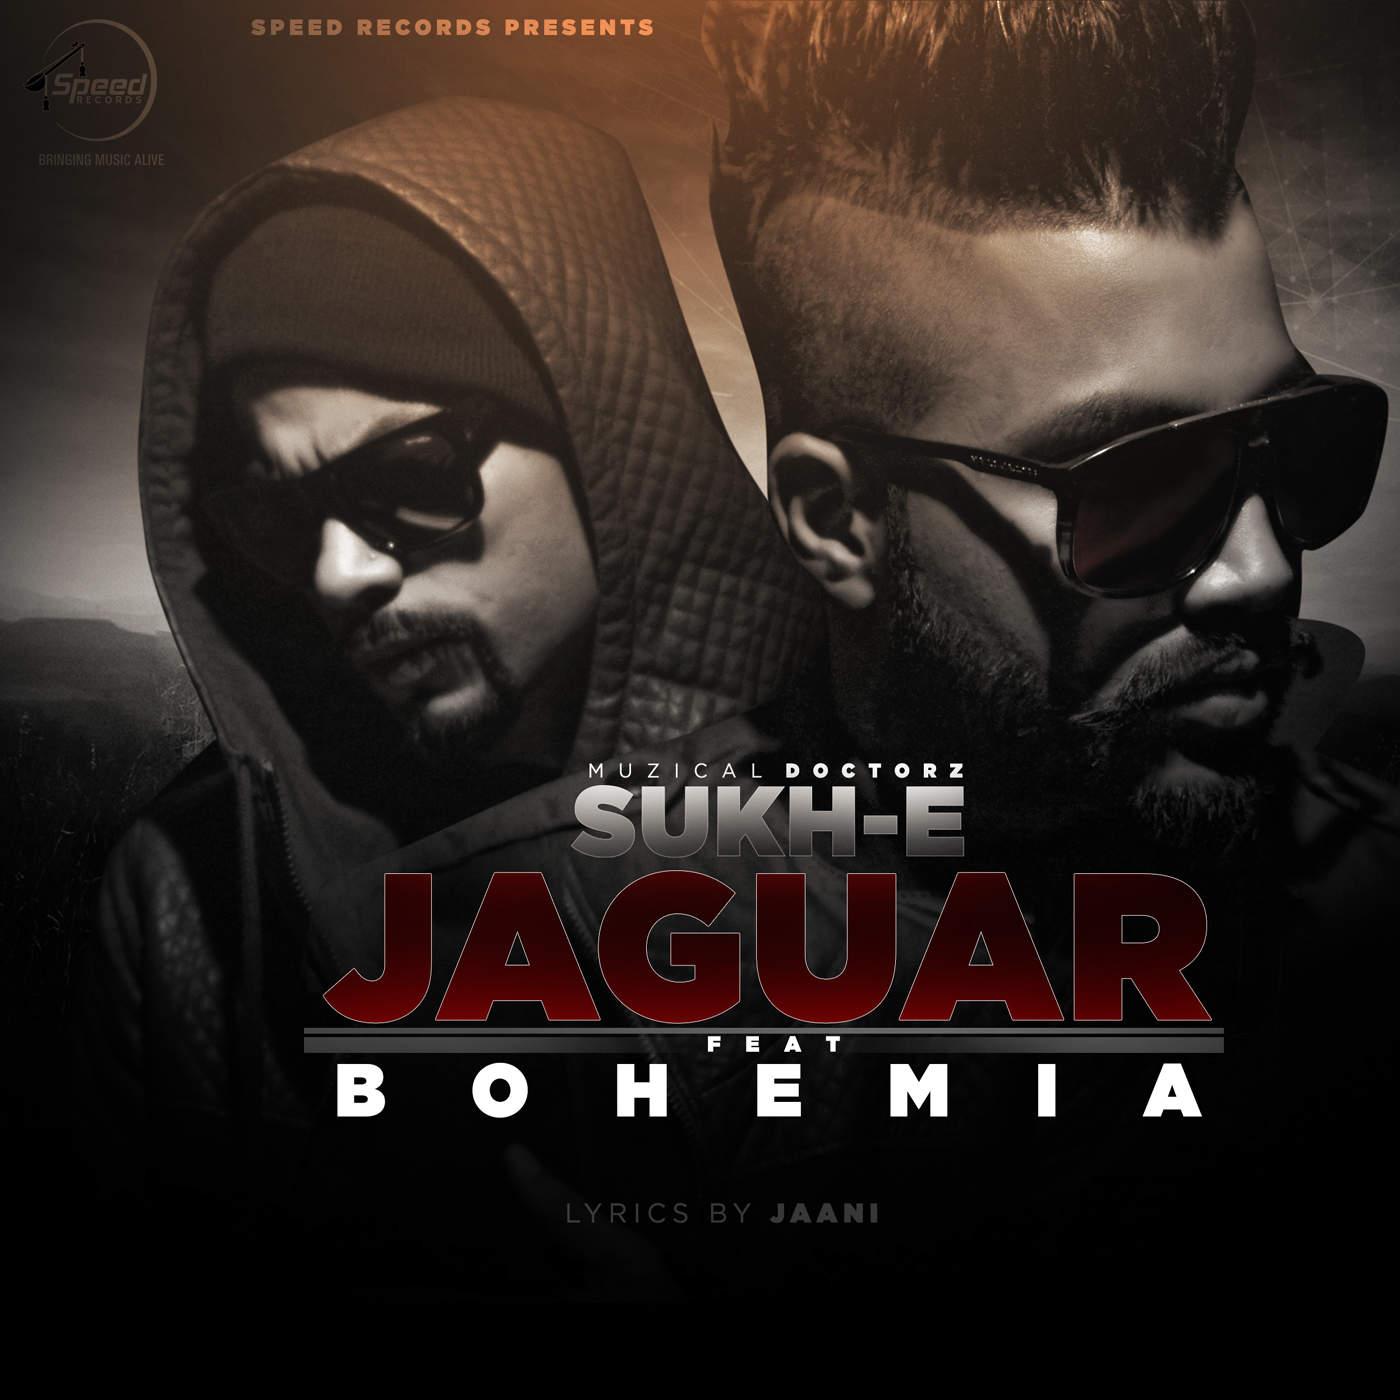 Muzical Doctorz Sukh-E & Bohemia - Jaguar (feat. Bohemia) - Single